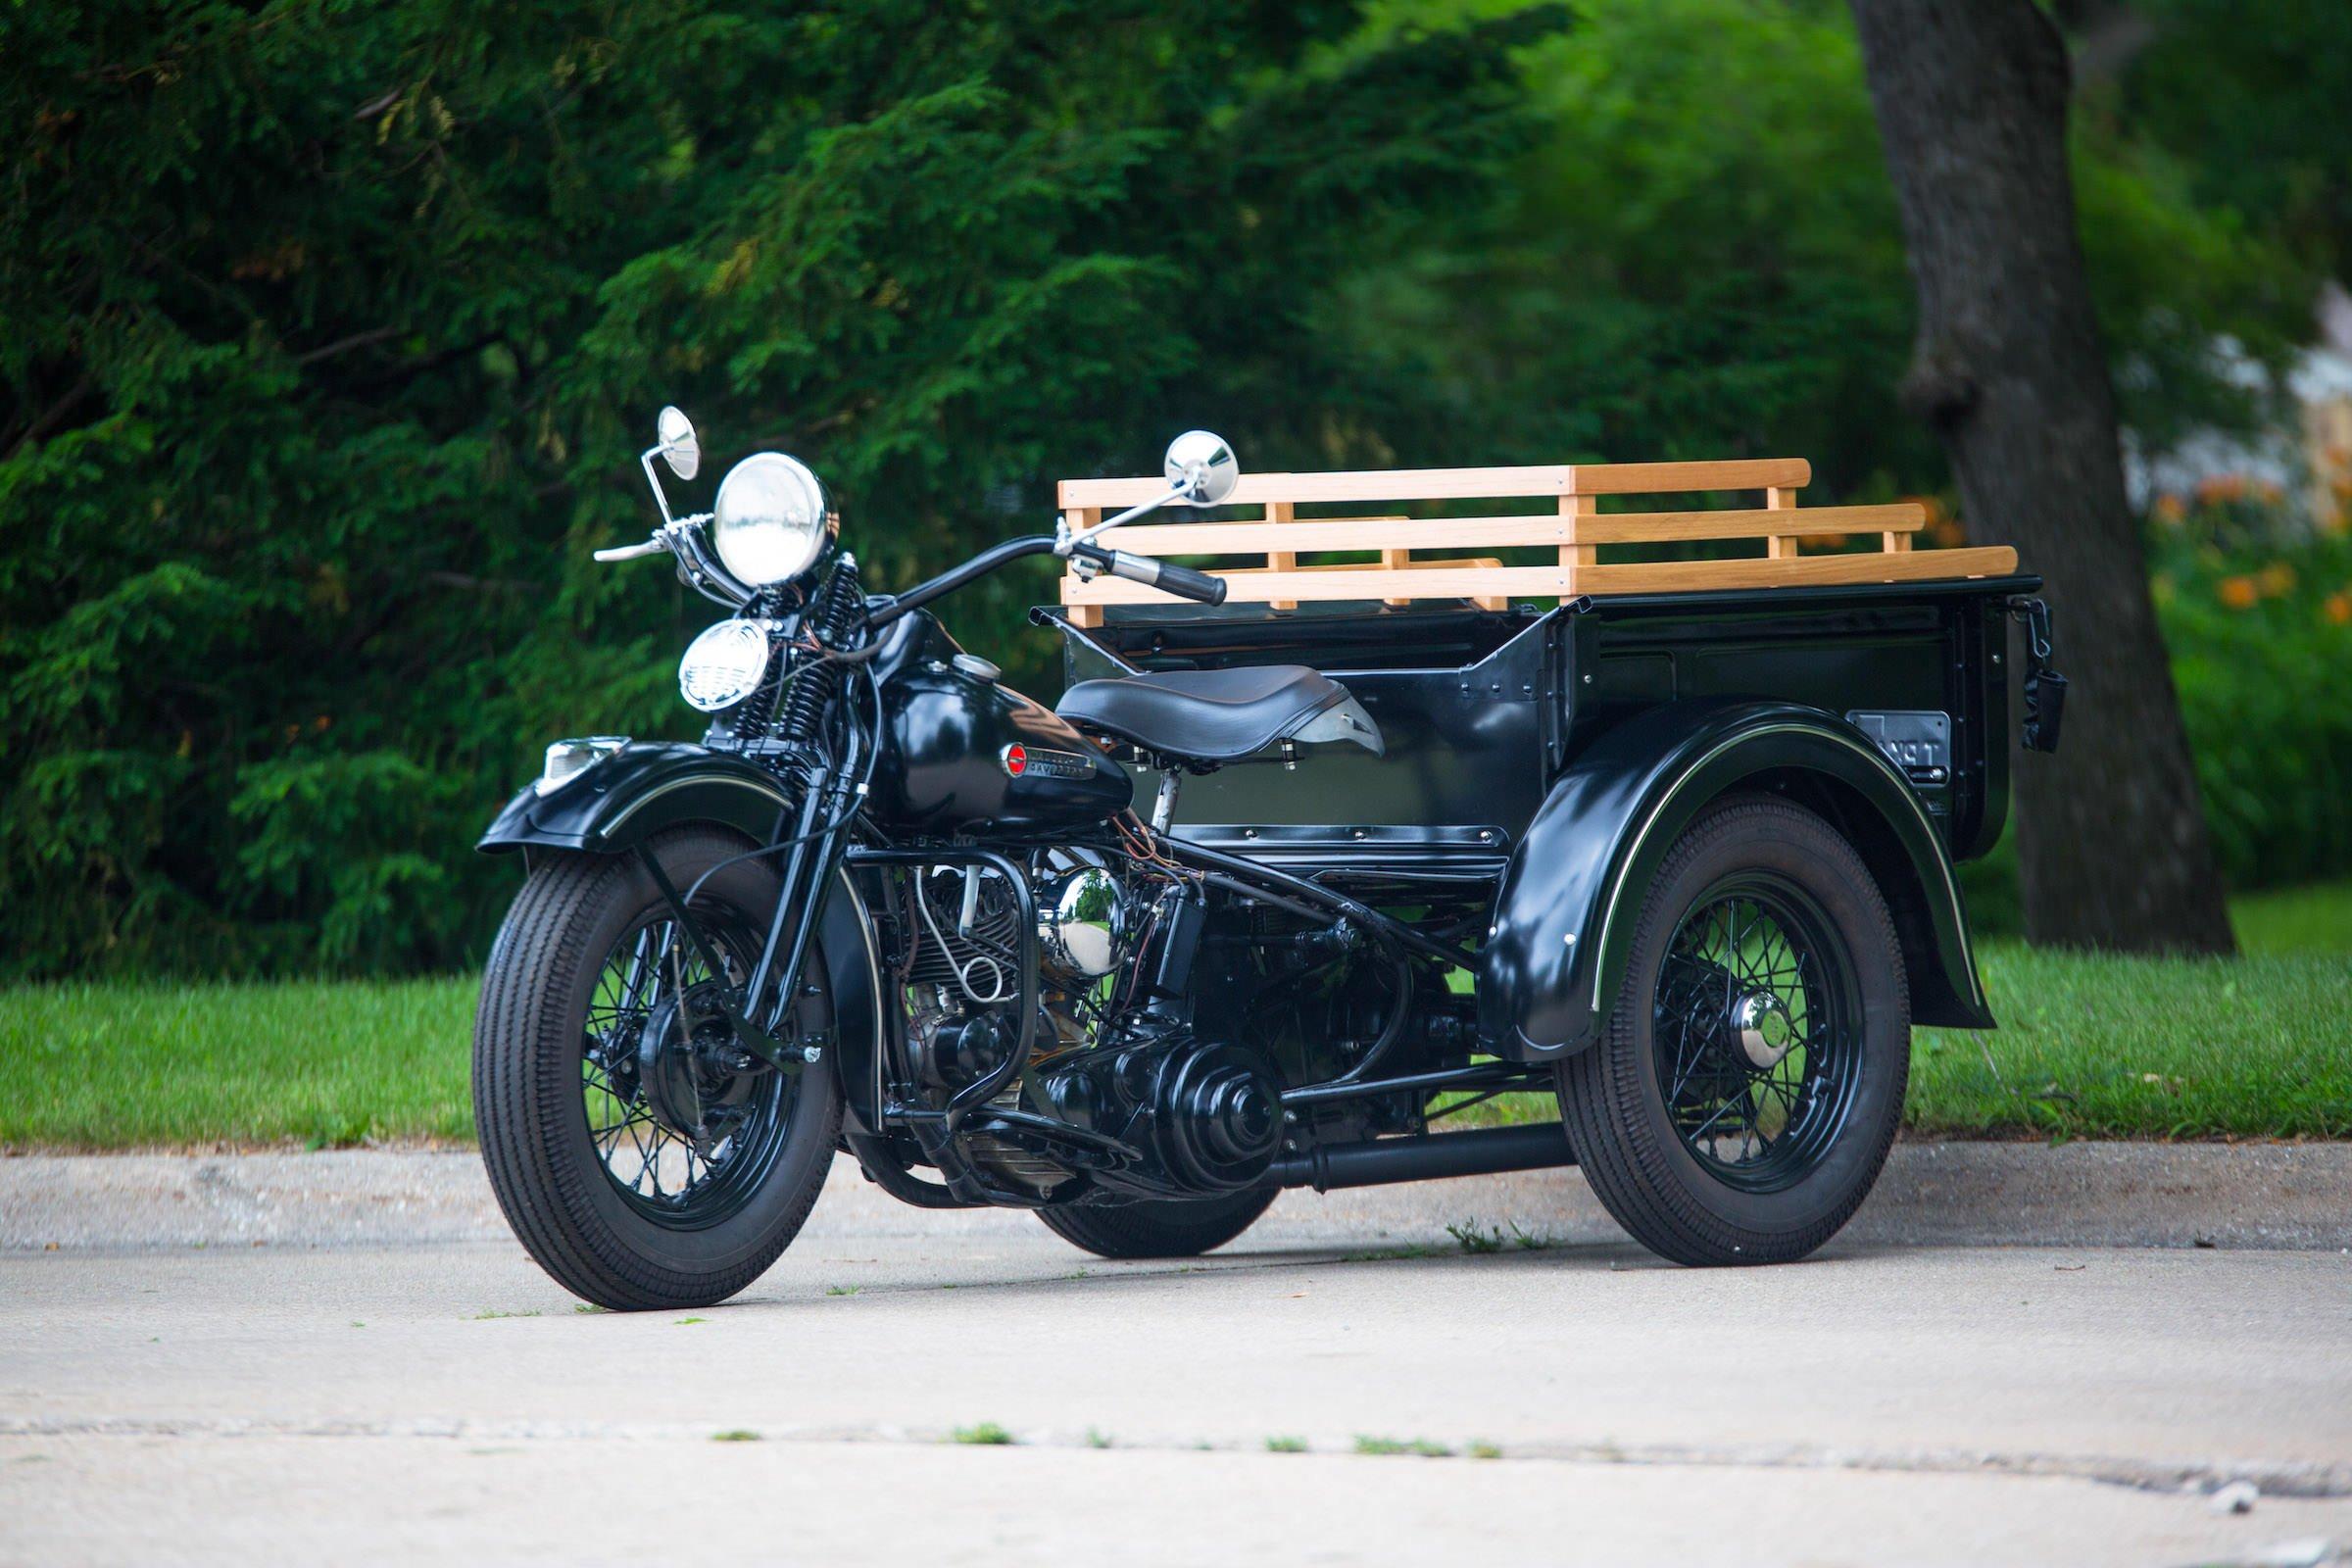 Harley Davidson: A Custom Harley-Davidson Servi-Car X Model T Ford